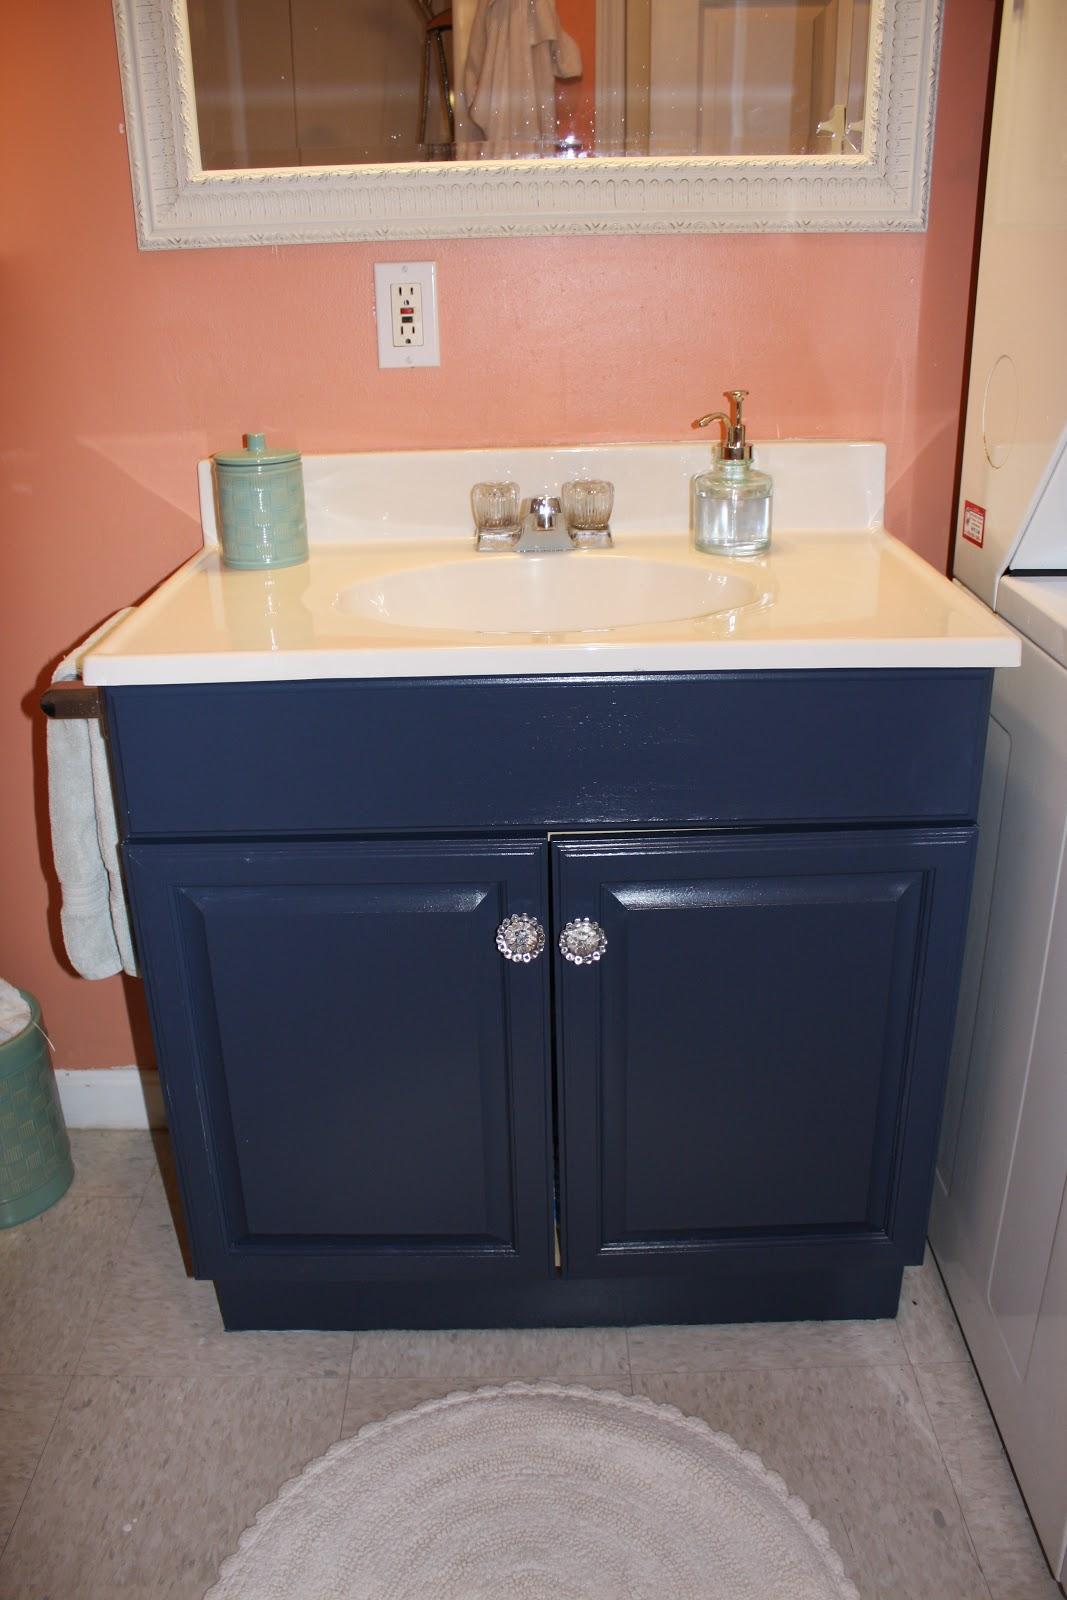 The elegant house painting a laminate bathroom vanity - Painting laminate bathroom cabinets ...